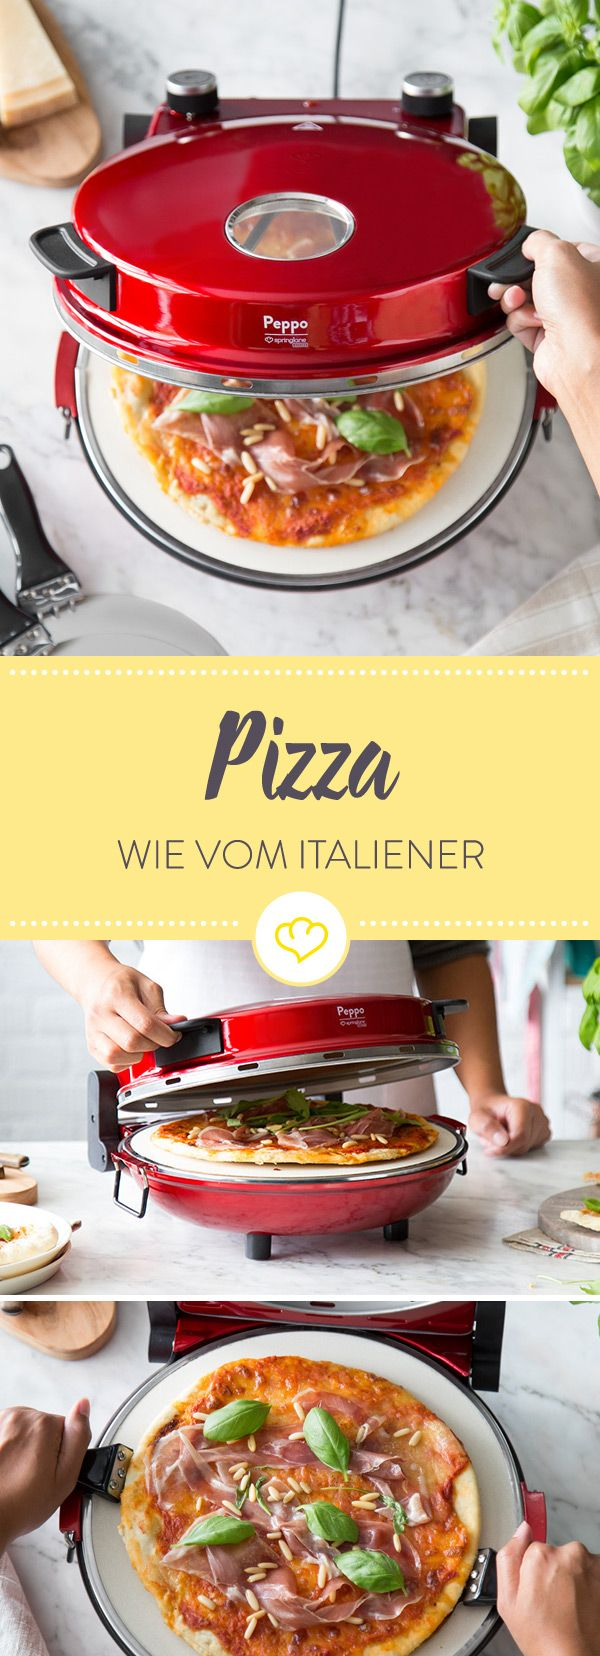 peppo pizzaofen springlane backzubeh r pizza pizzaofen und calzone. Black Bedroom Furniture Sets. Home Design Ideas